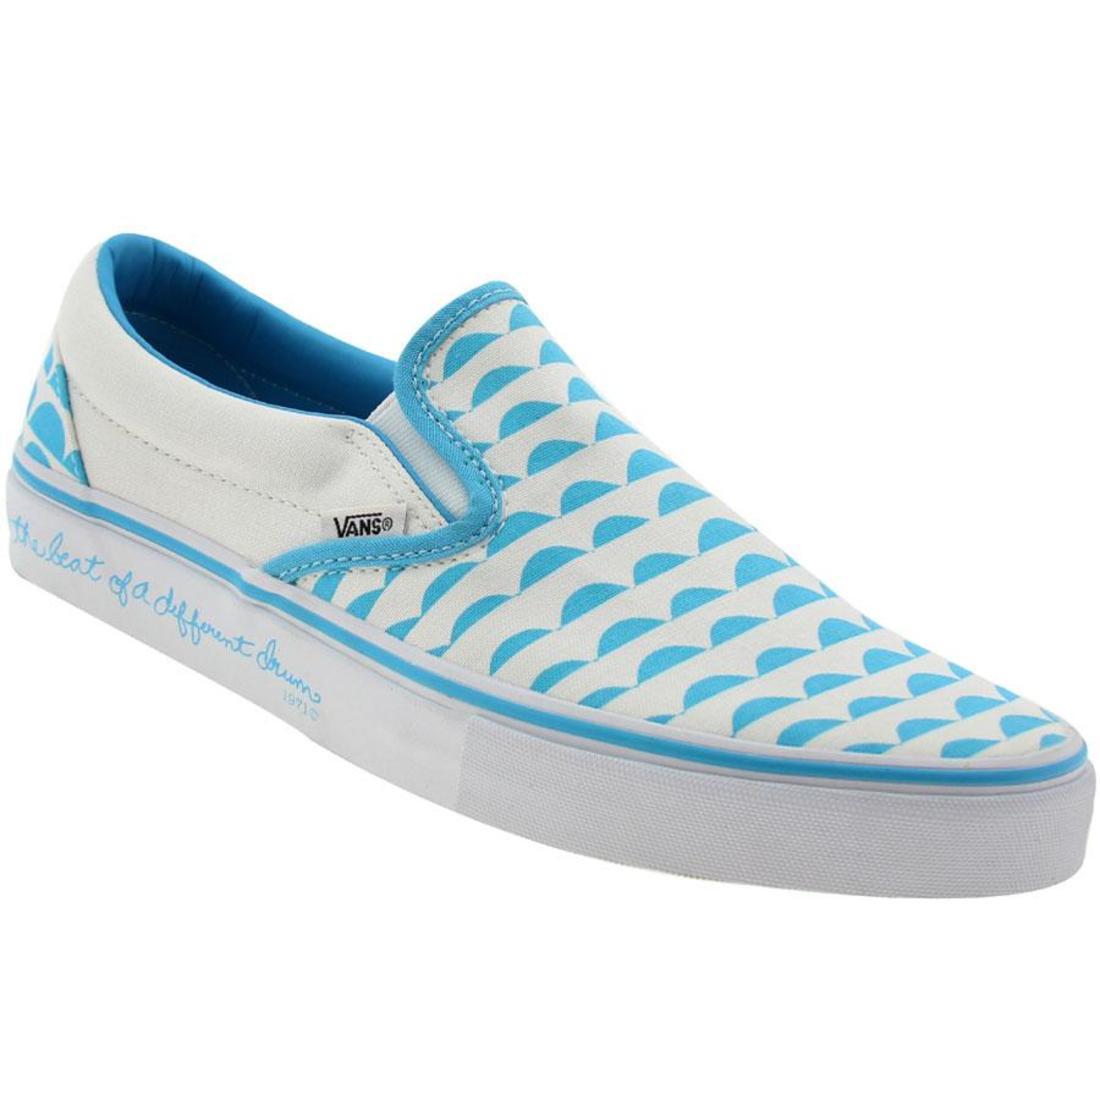 4736dd6bd36676 Vans Classic Slip-On LX - Galinsky Waves (aquarius   t white) 3 3 of 7 ...